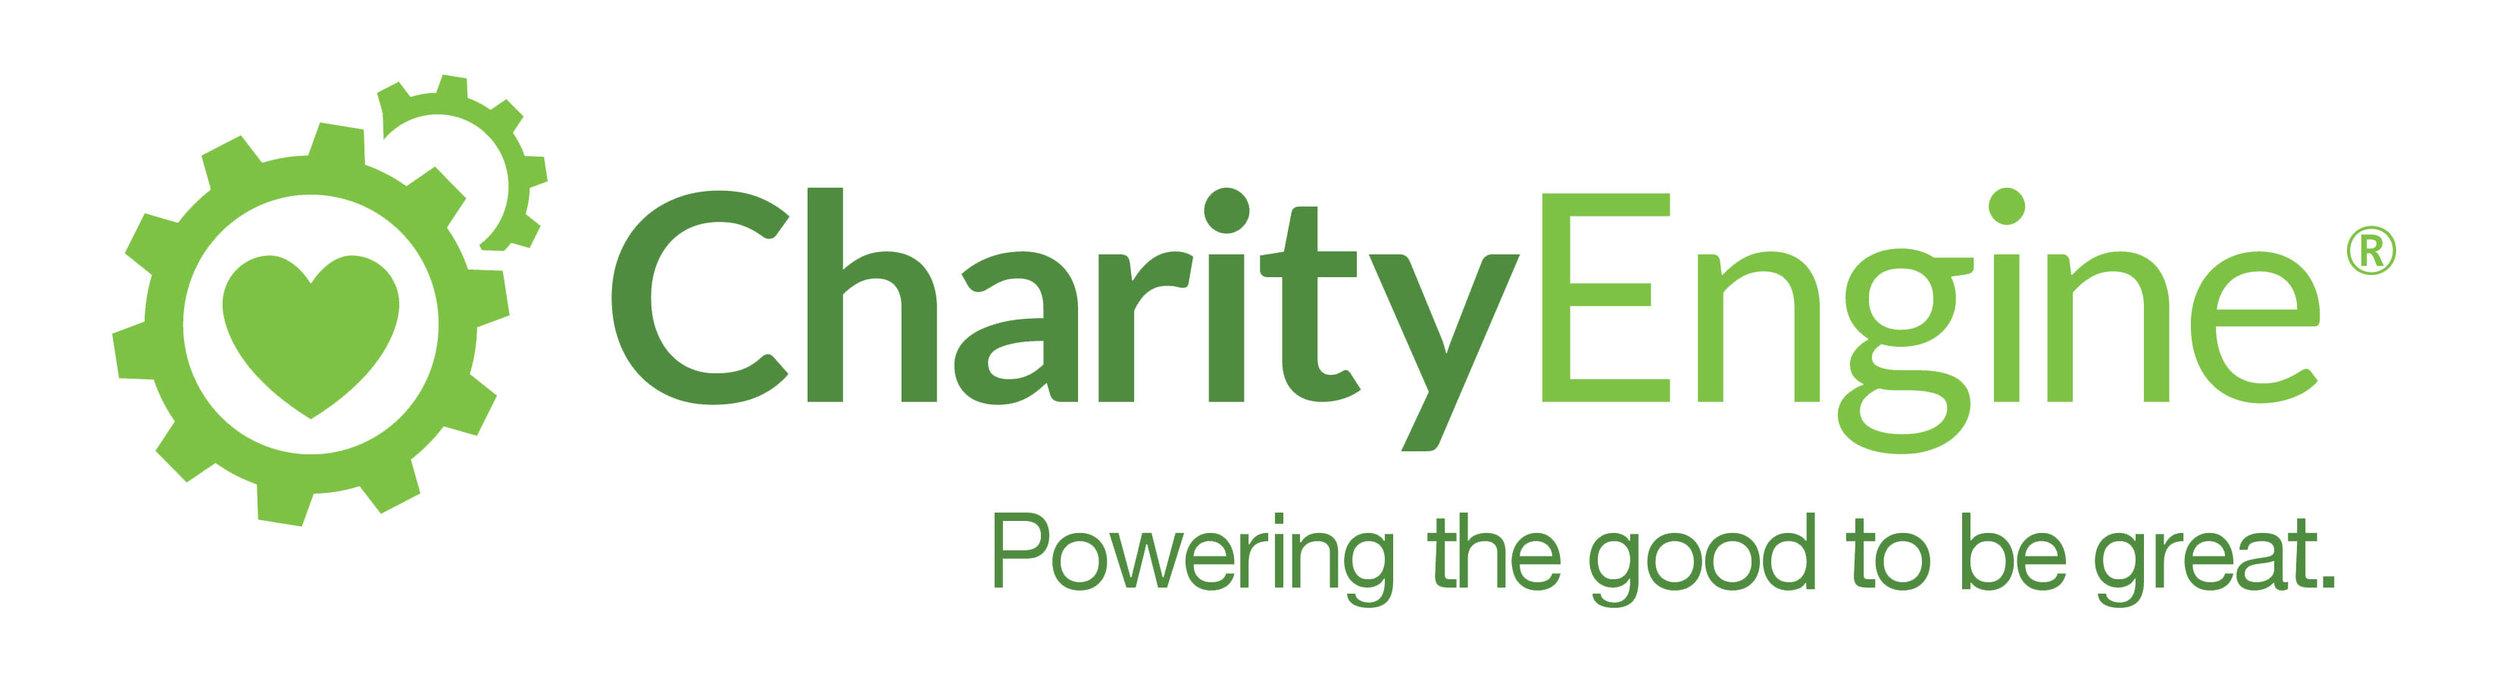 Charity Engine.jpg